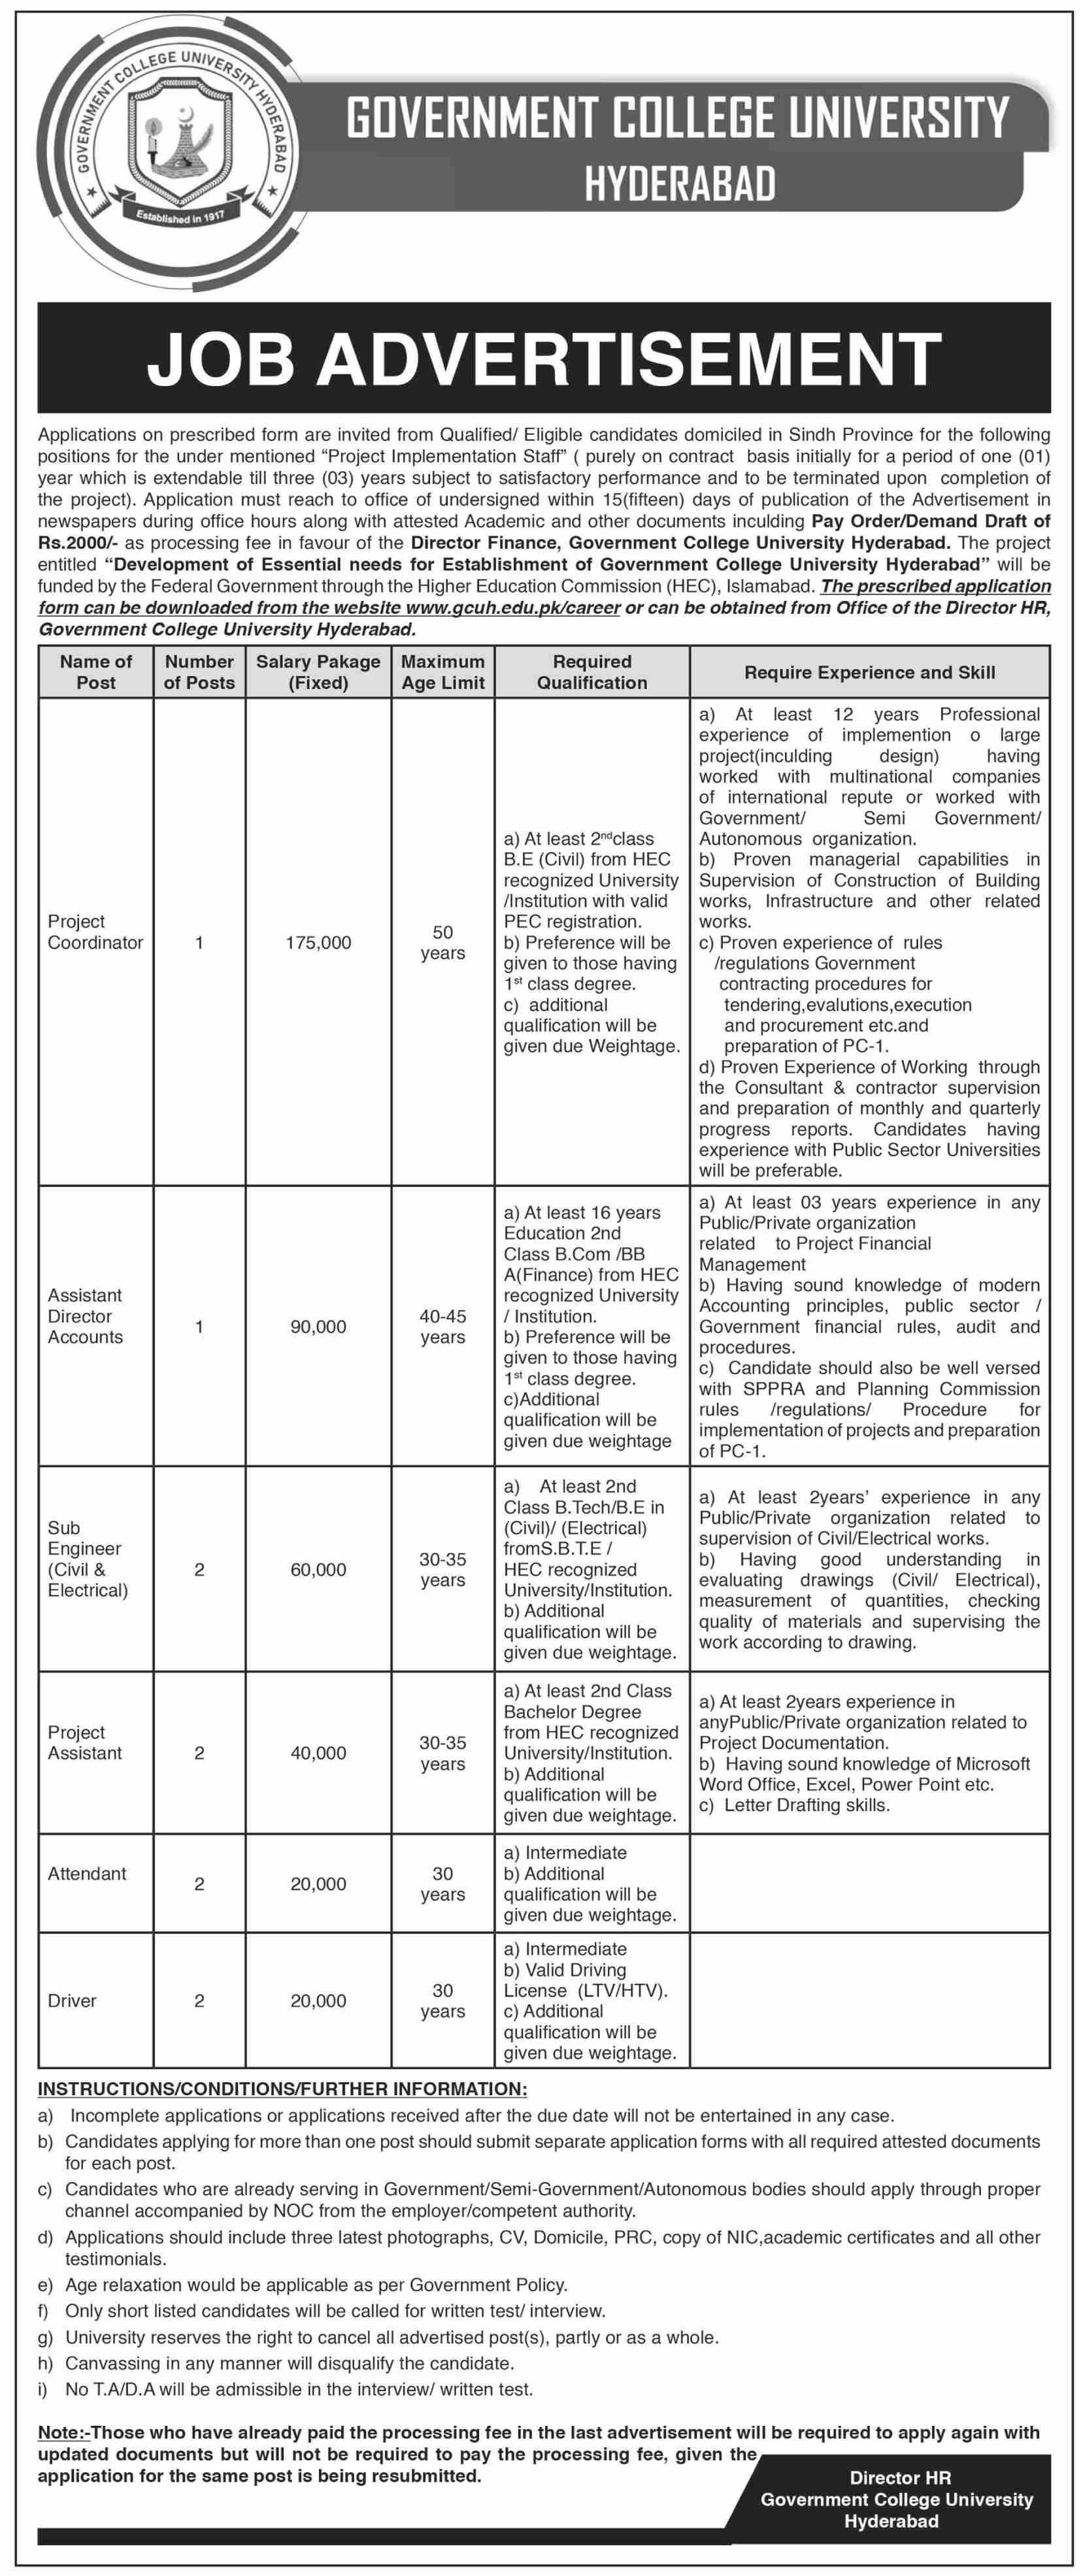 Government College University Hyderabad Vacancies 2021 – Latest Jobs 3